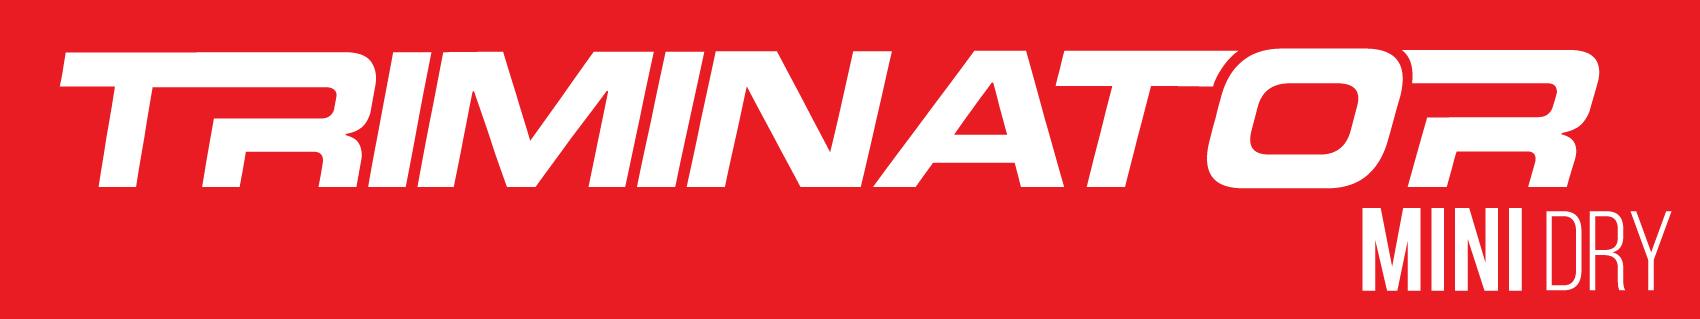 triminator logo